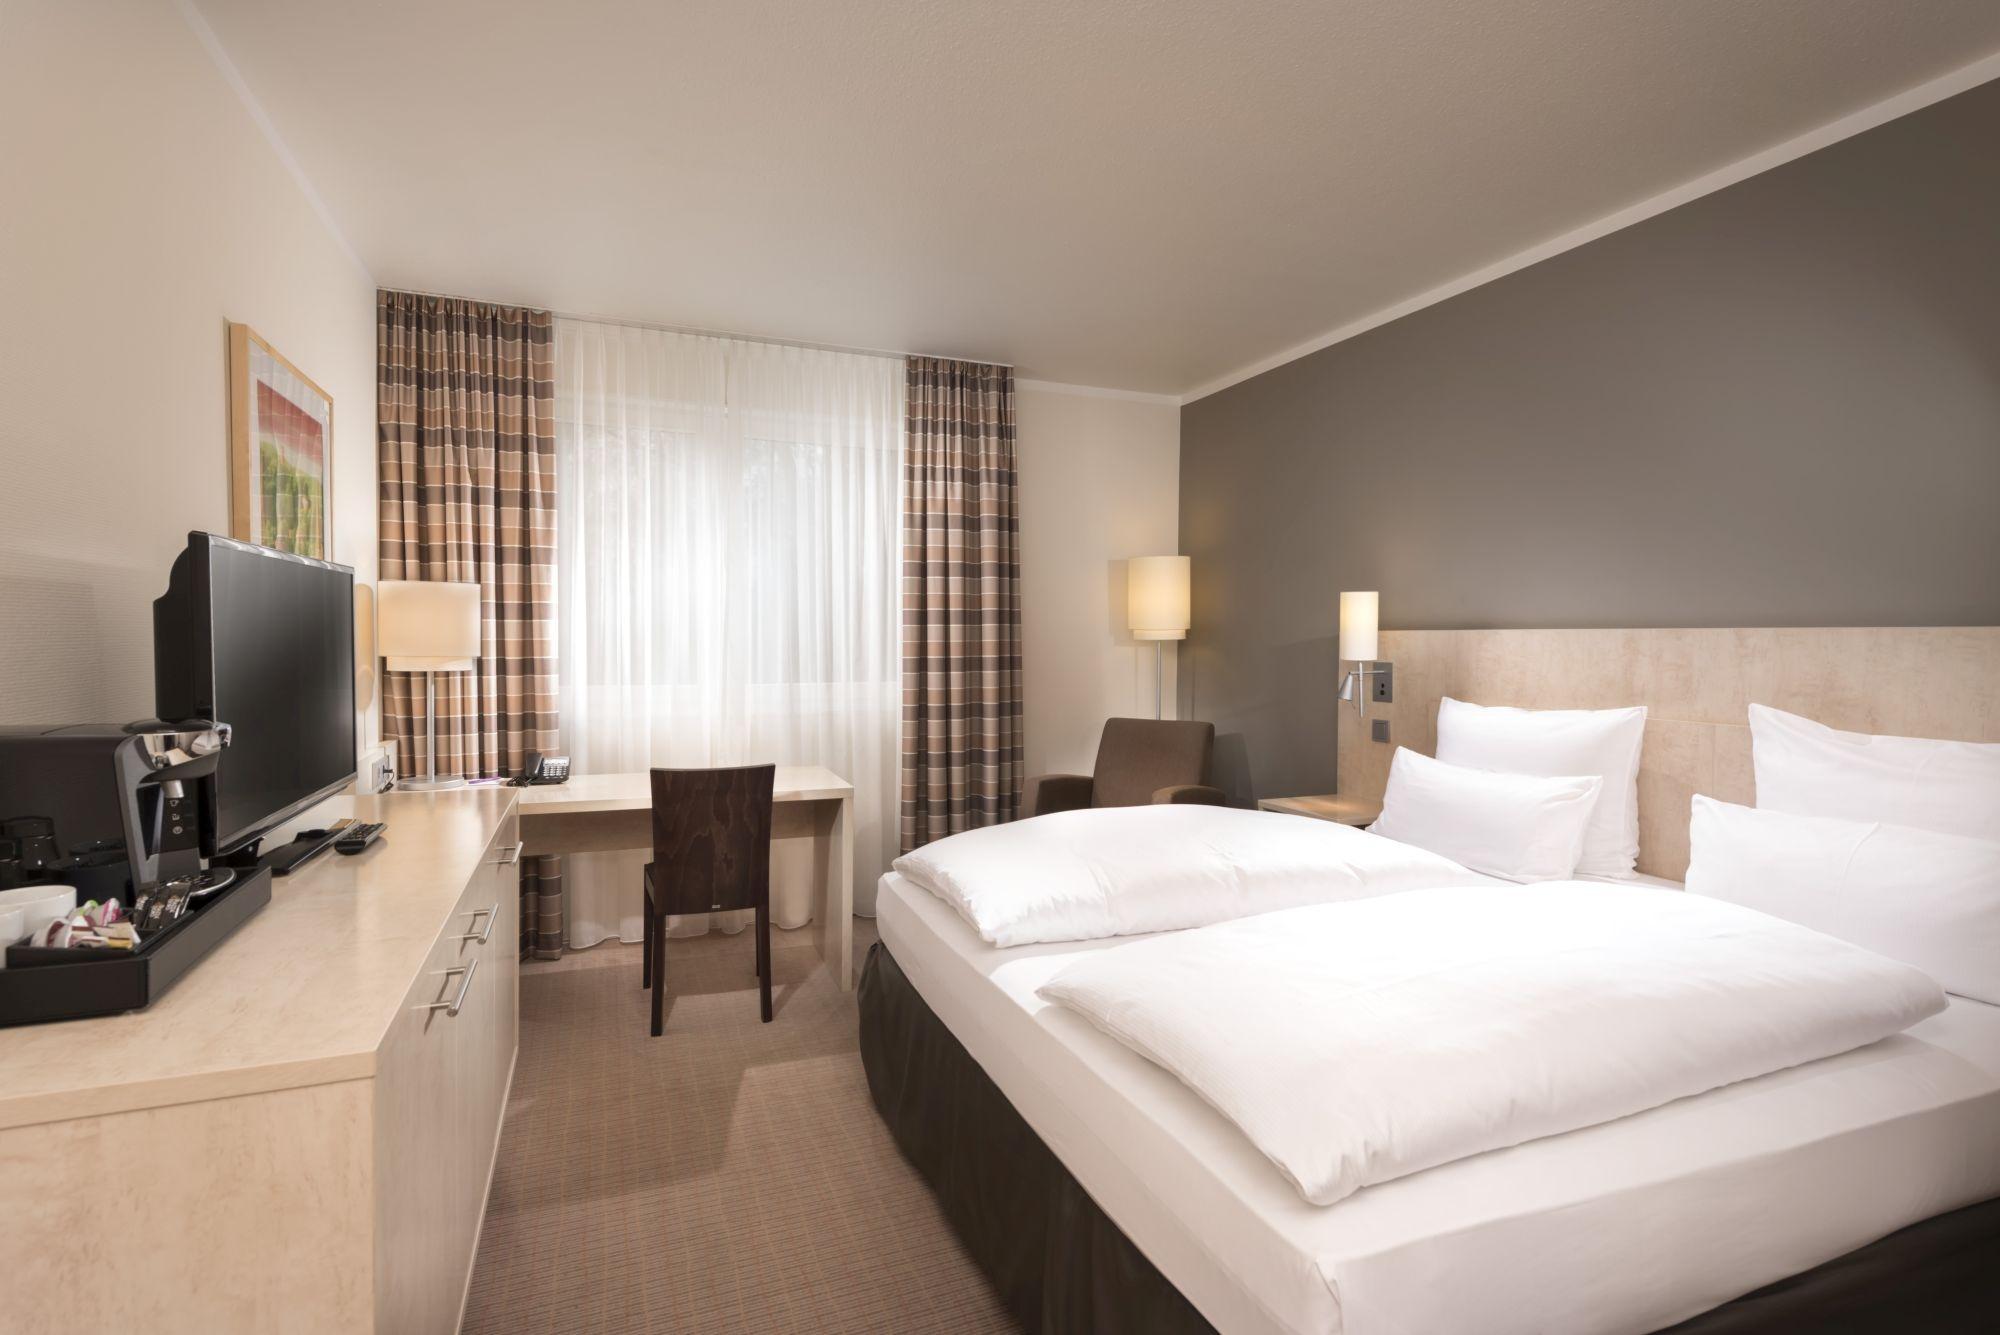 Doppelzimmer im Mercure Hotel Johannisberg Bielefeld